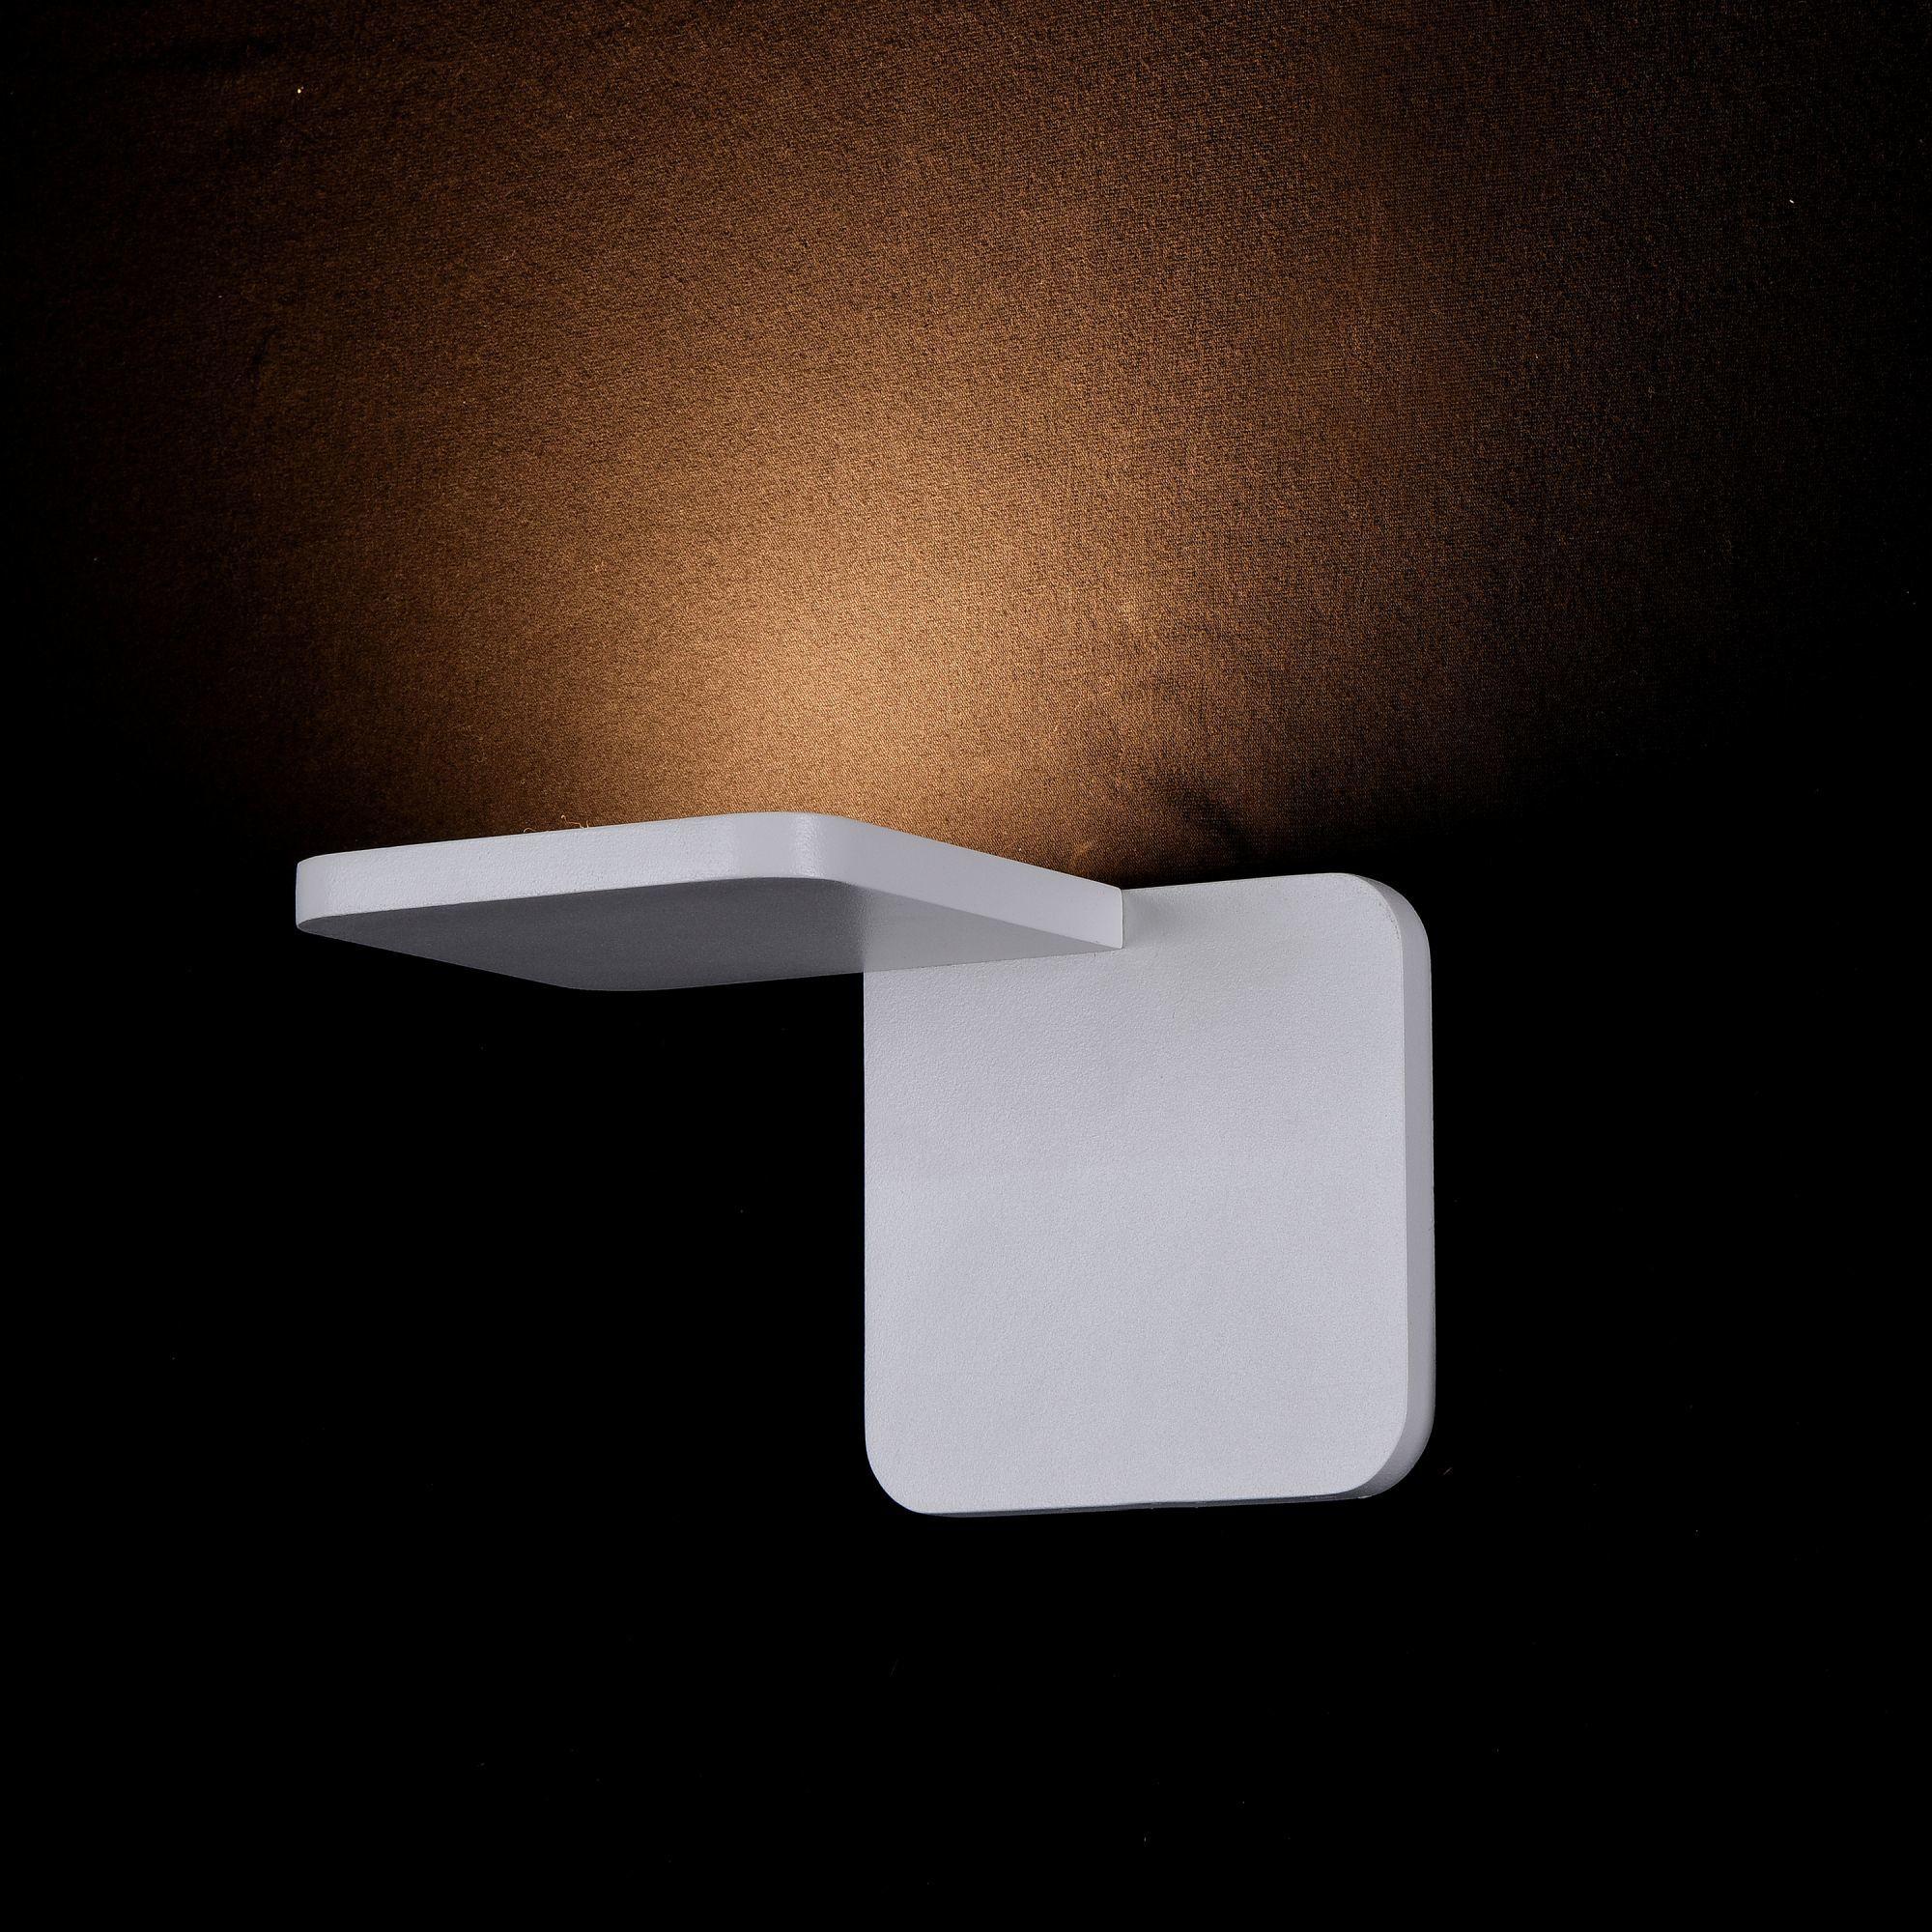 Настенный светодиодный светильник Maytoni Trame C807WL-L7W, LED SMD 2835 7W 3000K 350lm CRI84, белый, металл, стекло - фото 3